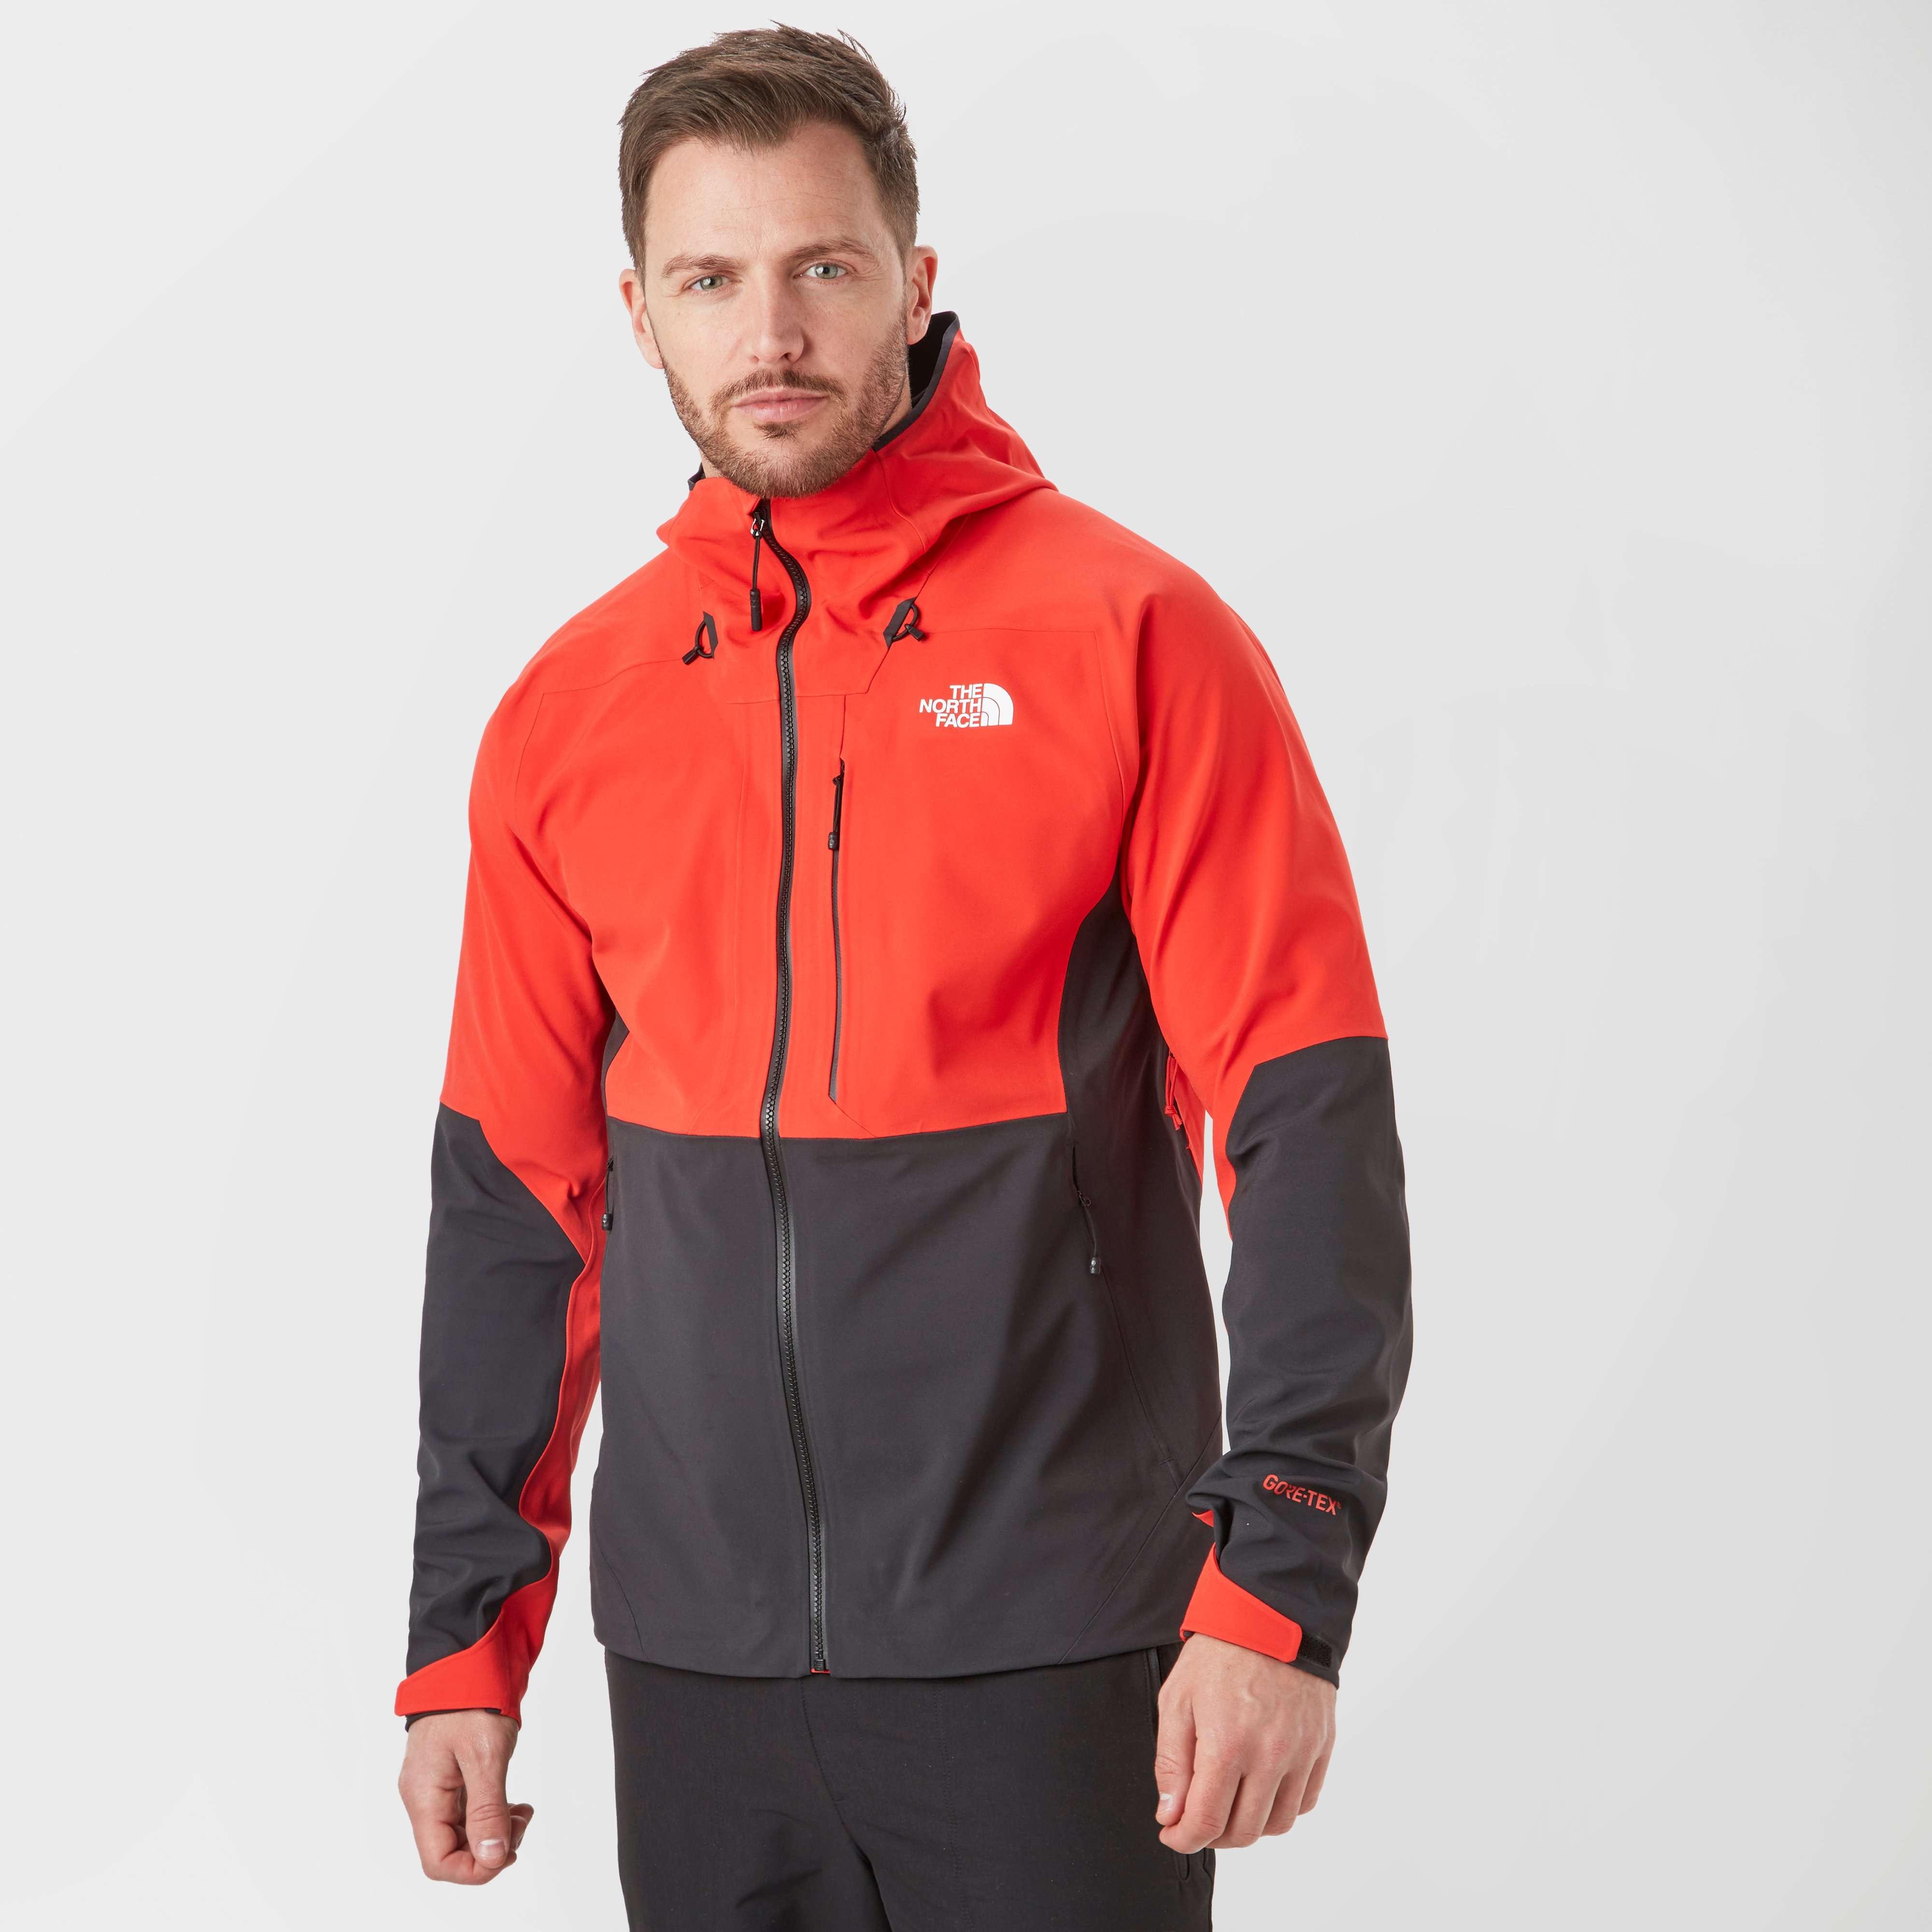 THE NORTH FACE Apex Flex GTX® 2.0 Jacket